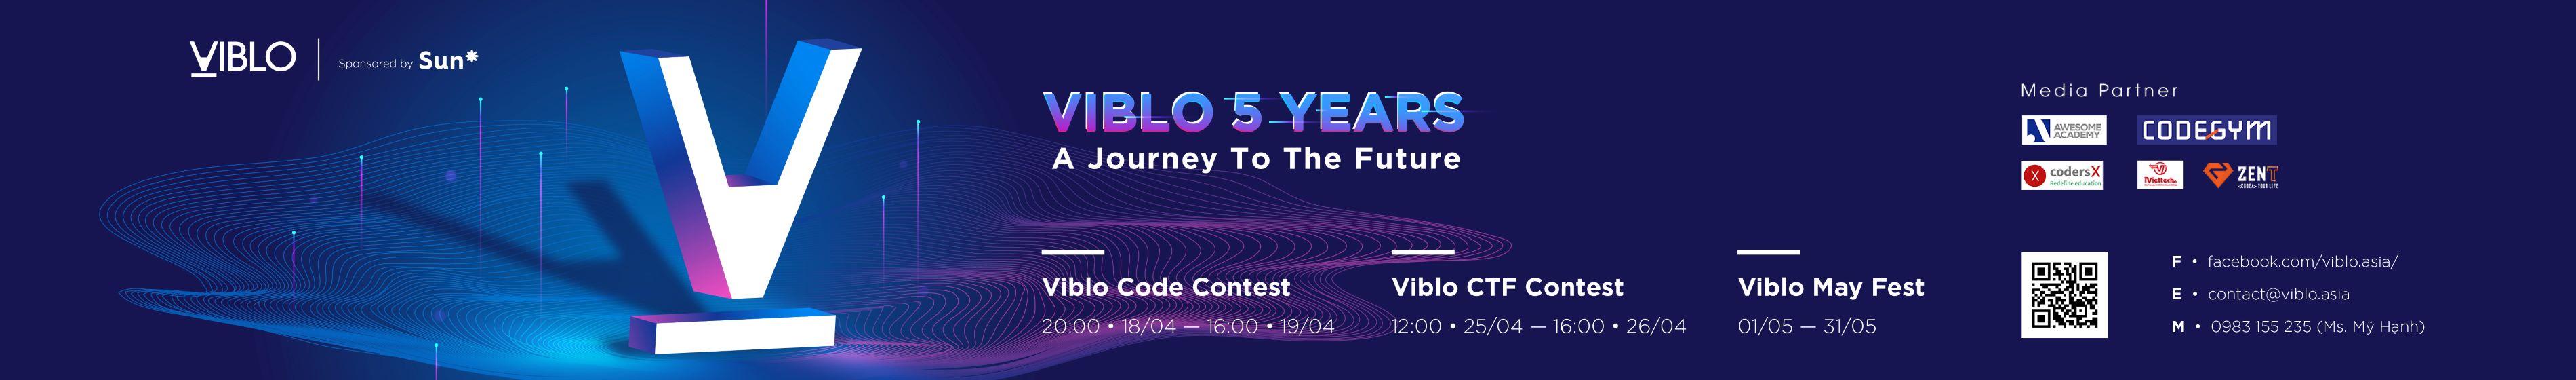 Viblo 5 Years